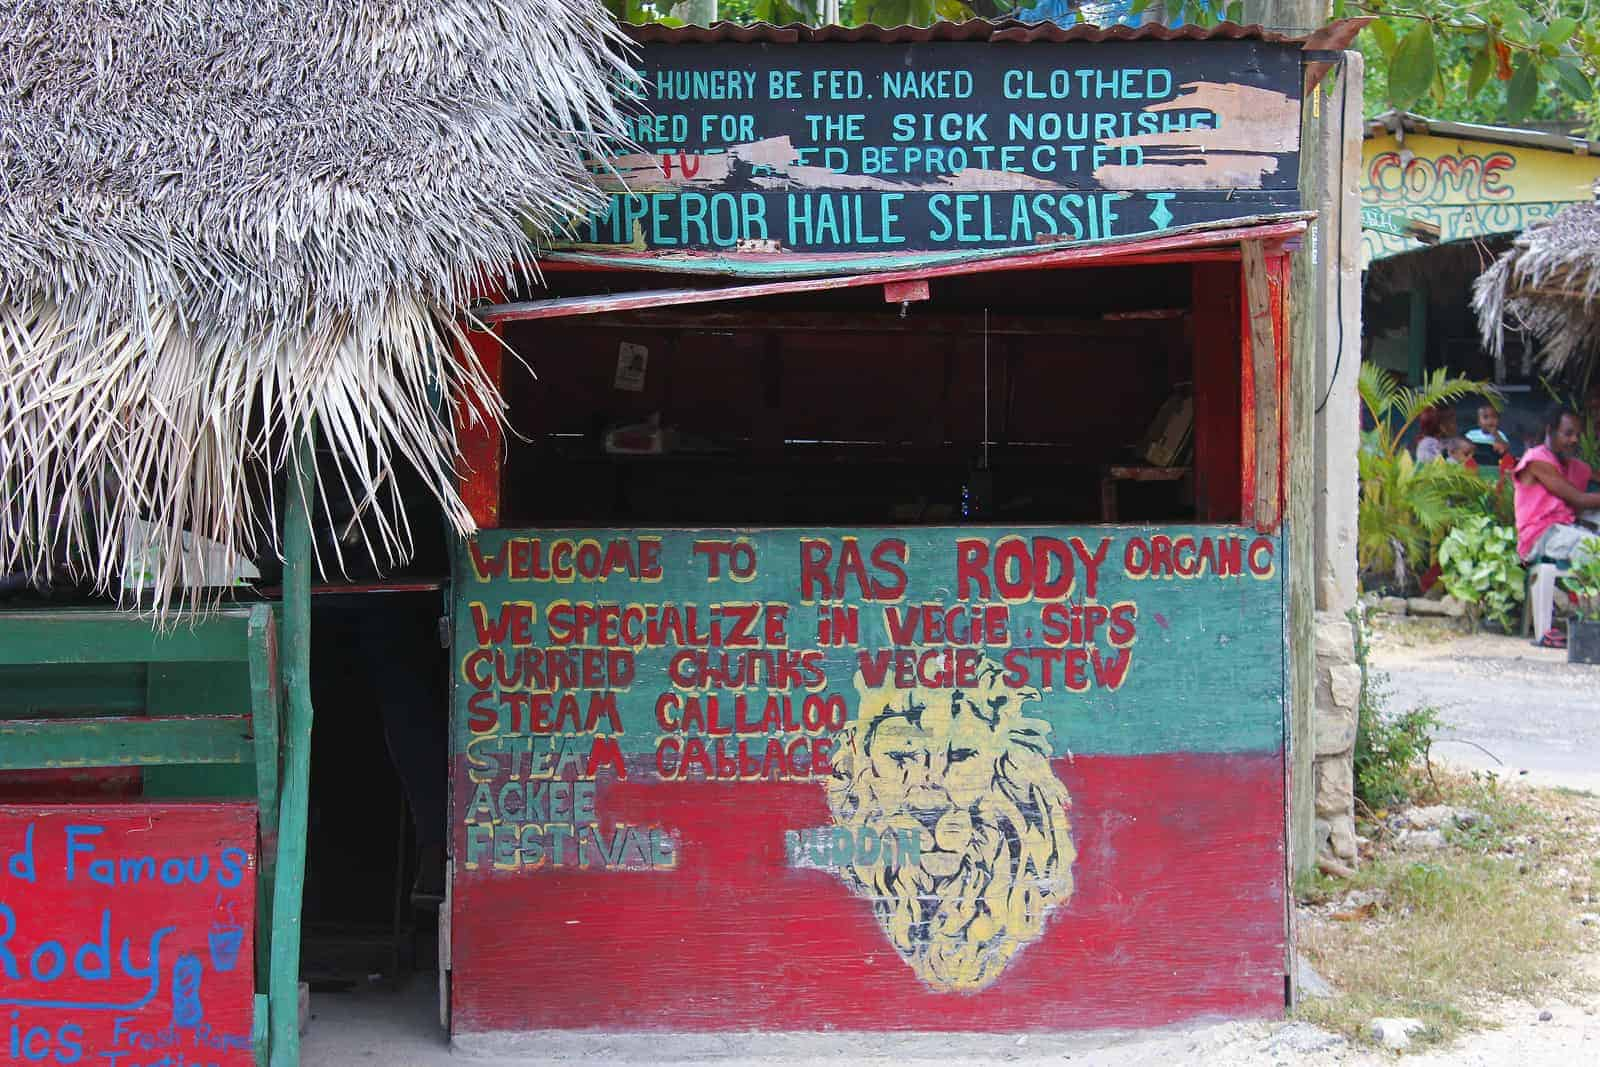 Ras Rody's Roadside Organic Vegan in Negril Jamaica